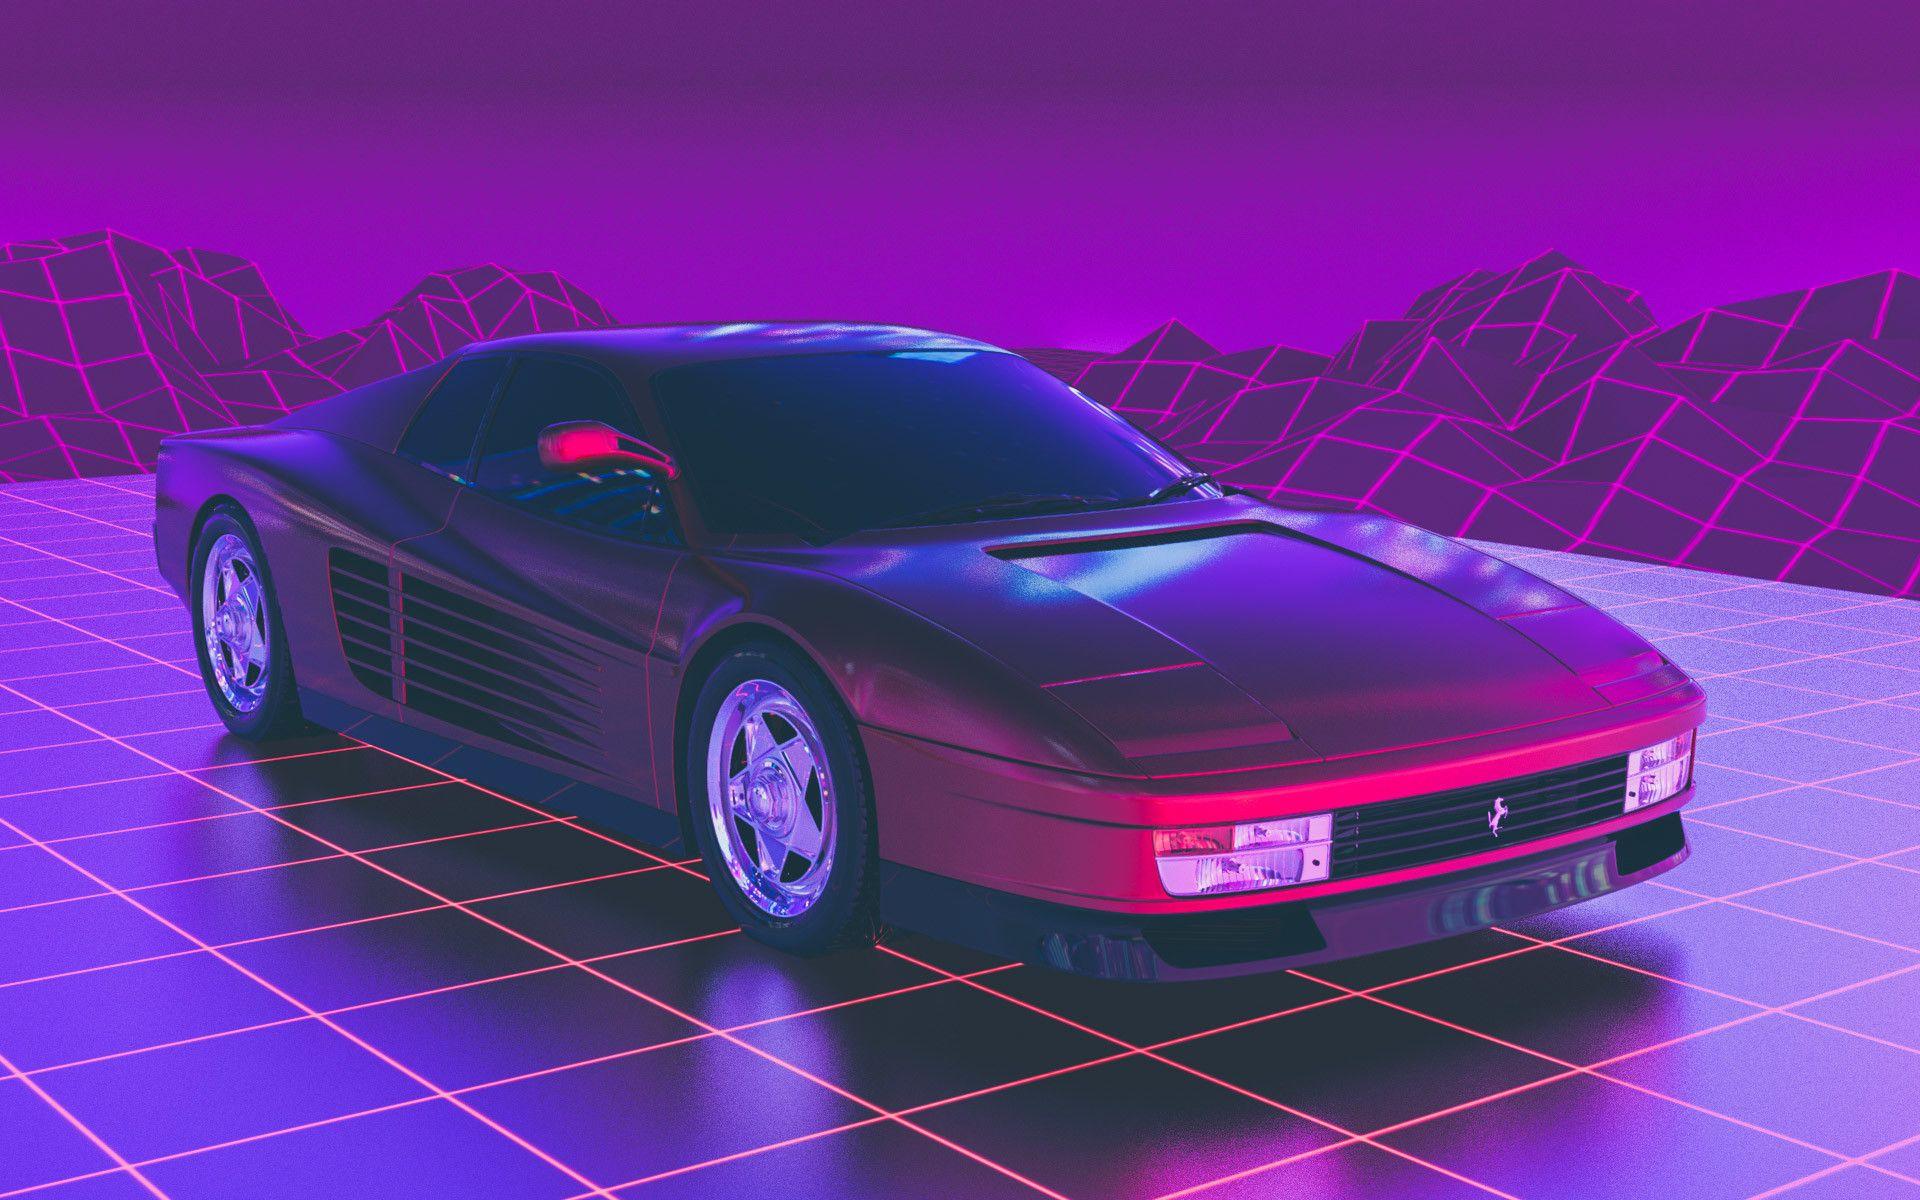 Ferrari Testarossa Arslan Safiullin Ferrari Testarossa Vaporwave Synthwave